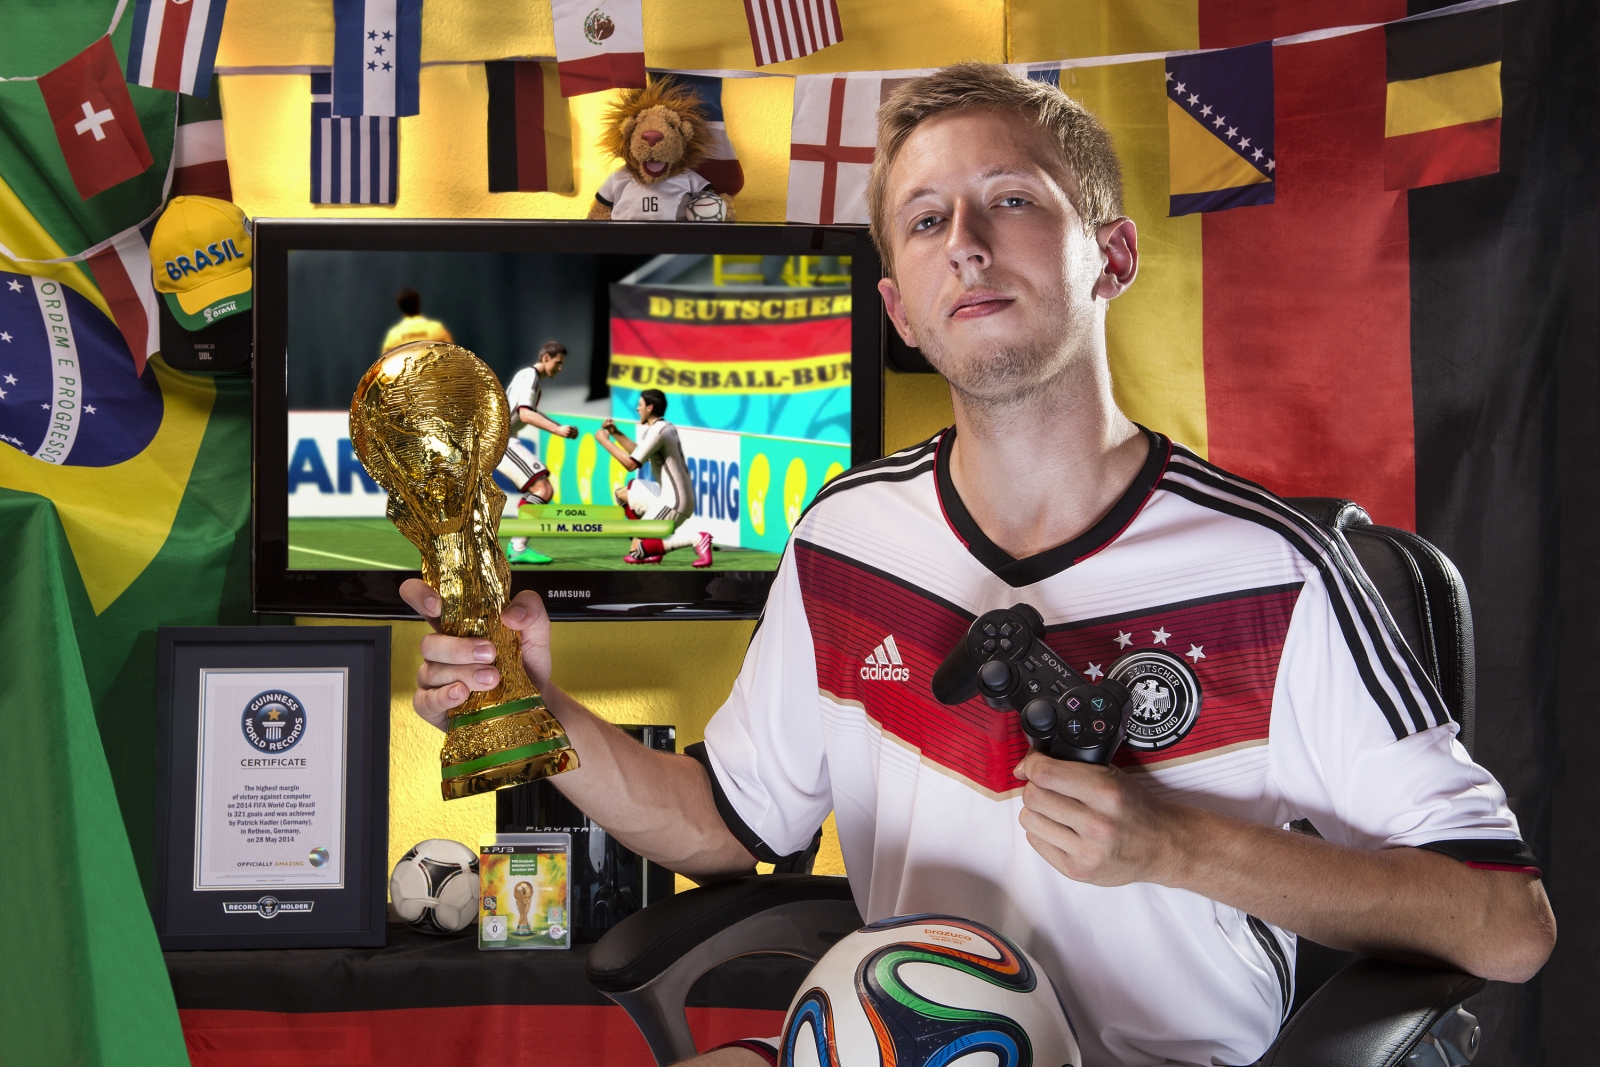 Guinness World Records 2015 Gamer's Edition Revealed